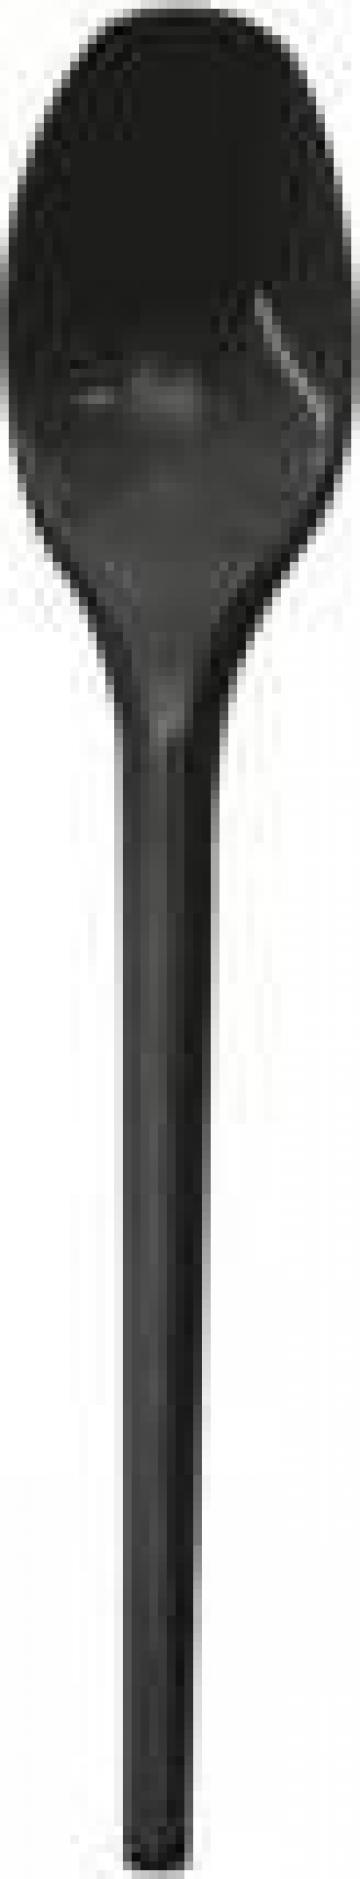 Lingurite lux negre 100 buc/set de la Cristian Food Industry Srl.